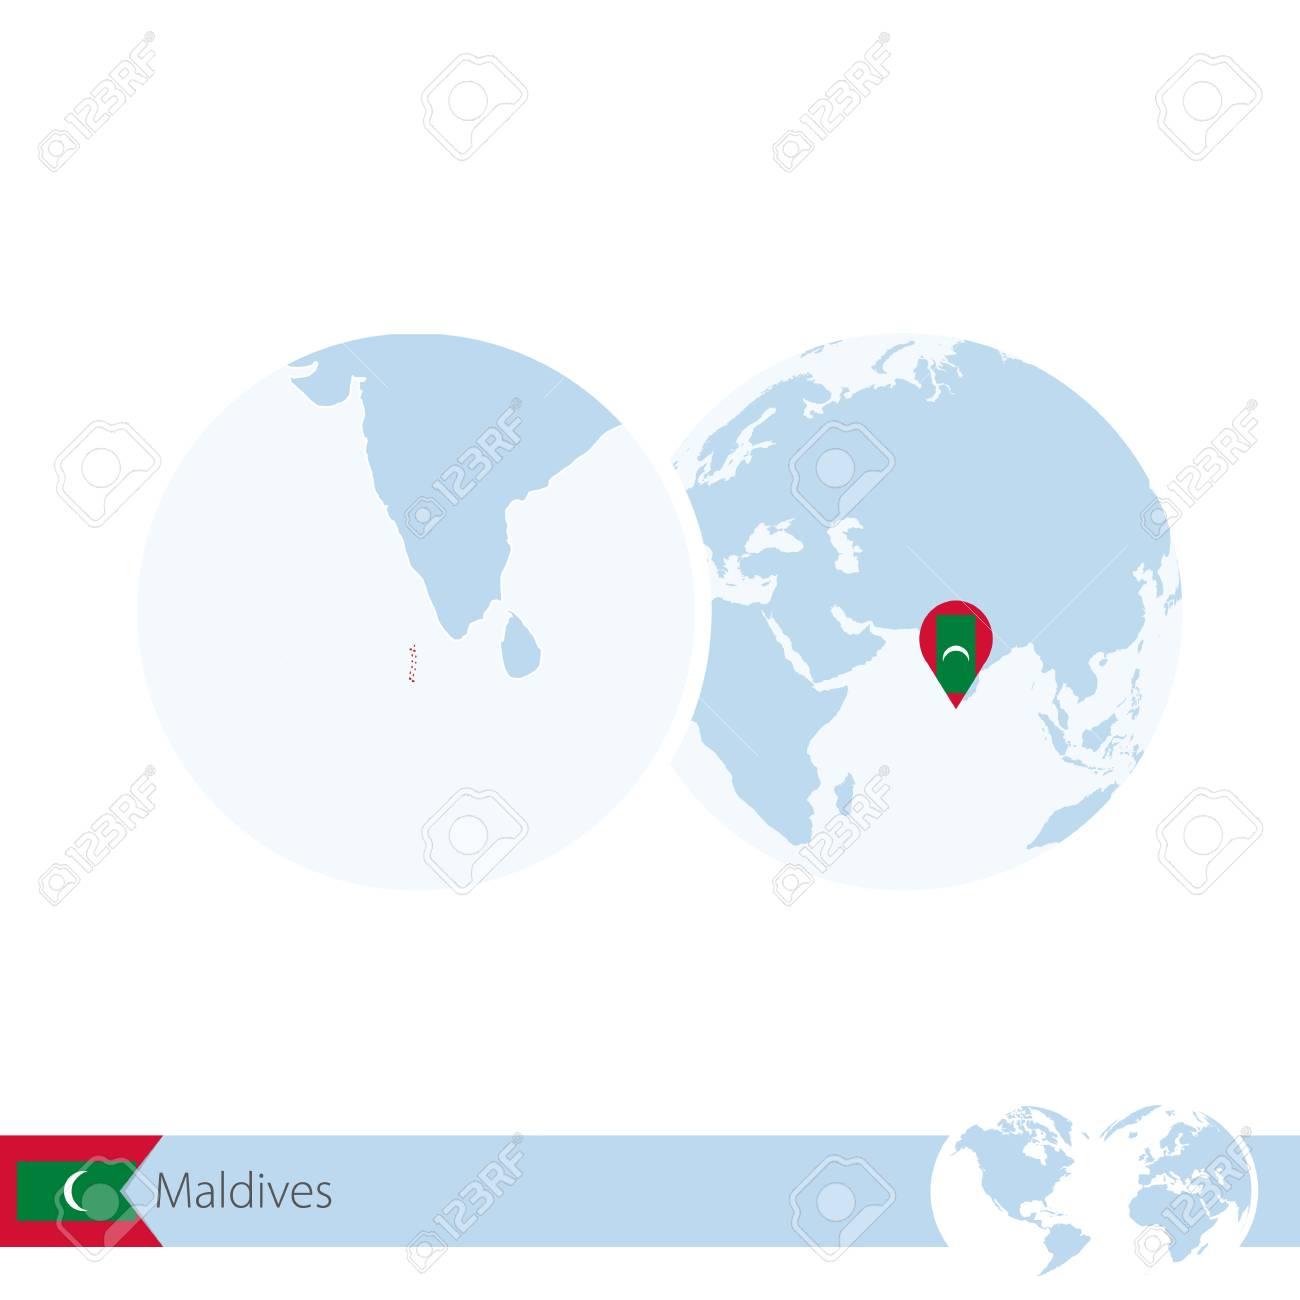 Maldives on world globe with flag and regional map of Maldives...